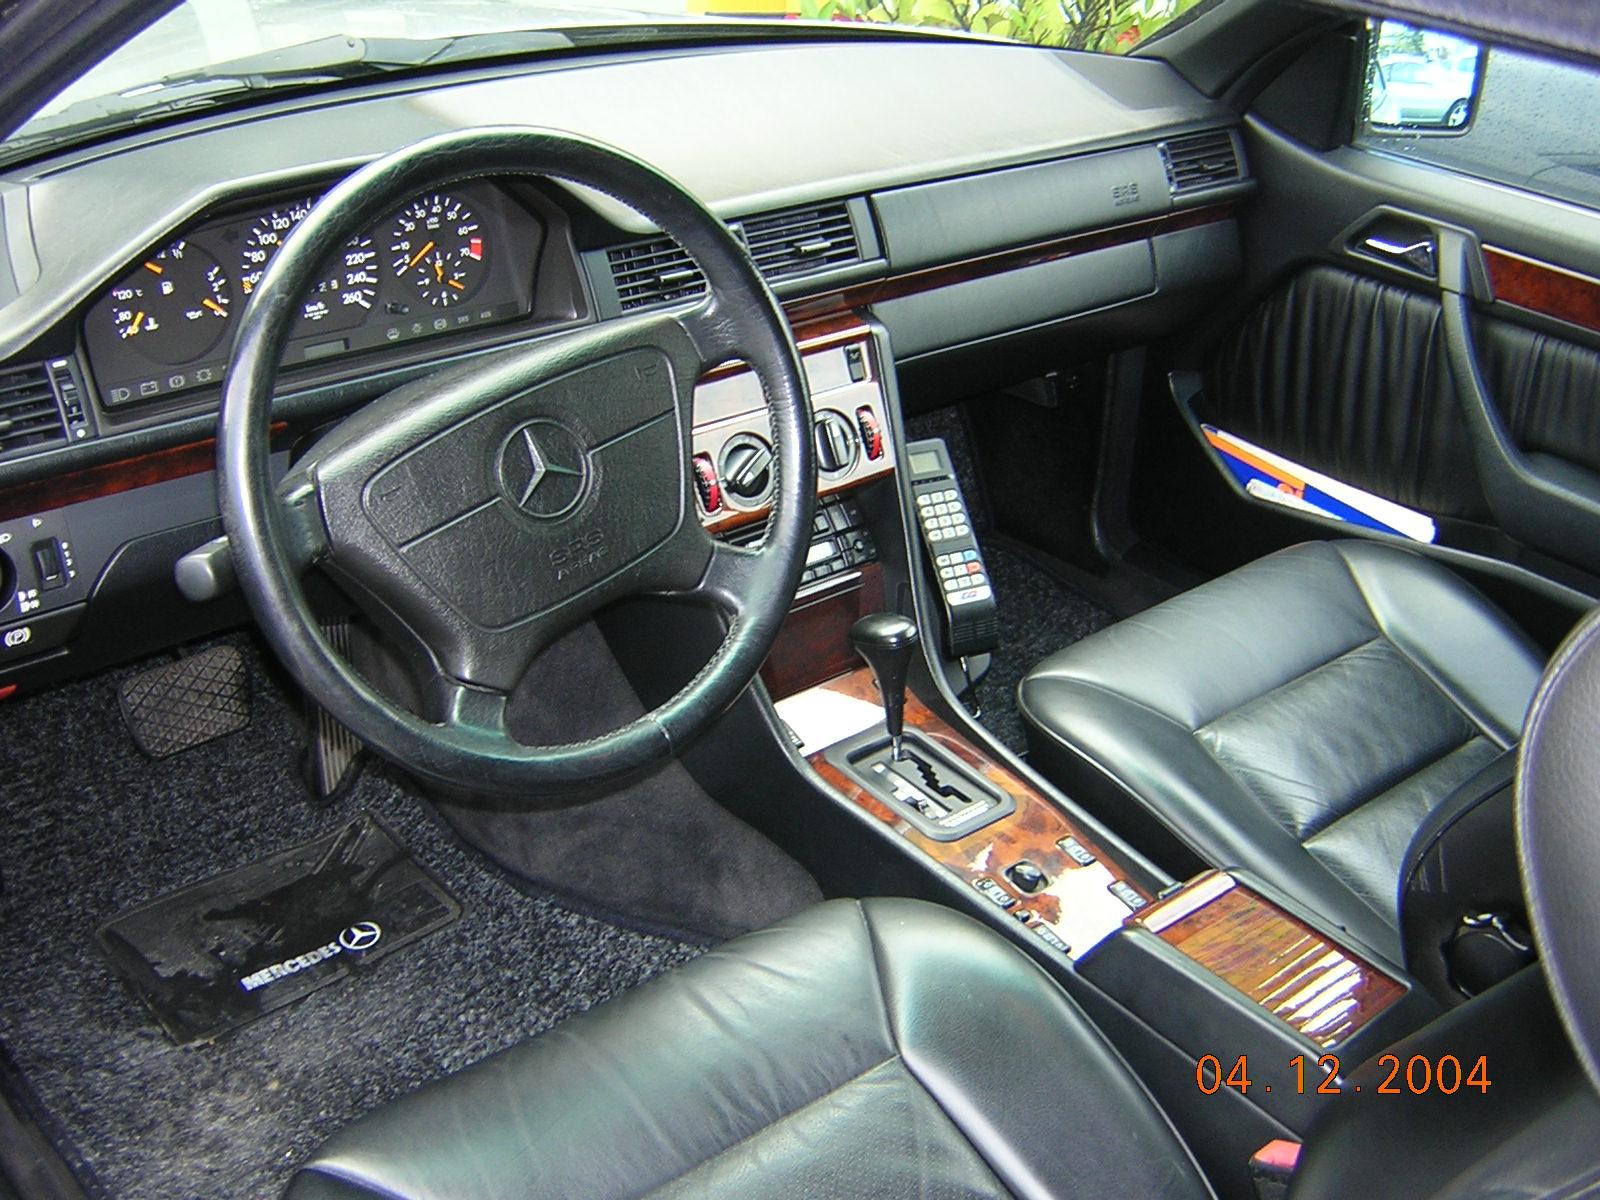 Mercedes W124 Turns 30 likewise Mercedes benz oil cooler 1245000000 de also Mercedes Benz E Class W124 Classic Car Review Honest John also Mercedes Benz W124 1984 1993 300ce Sterta Faktur 1 Wlasciciel Unikat 1 Rok Produkcji Asd Manual ID6zjcPb as well Mercedes Benz W124 1984 1993 300ce Coupe Automat Klima Kolekcjonerski ID6yOhbb. on 1987 1993 mercedes benz 300 ce coupe w124